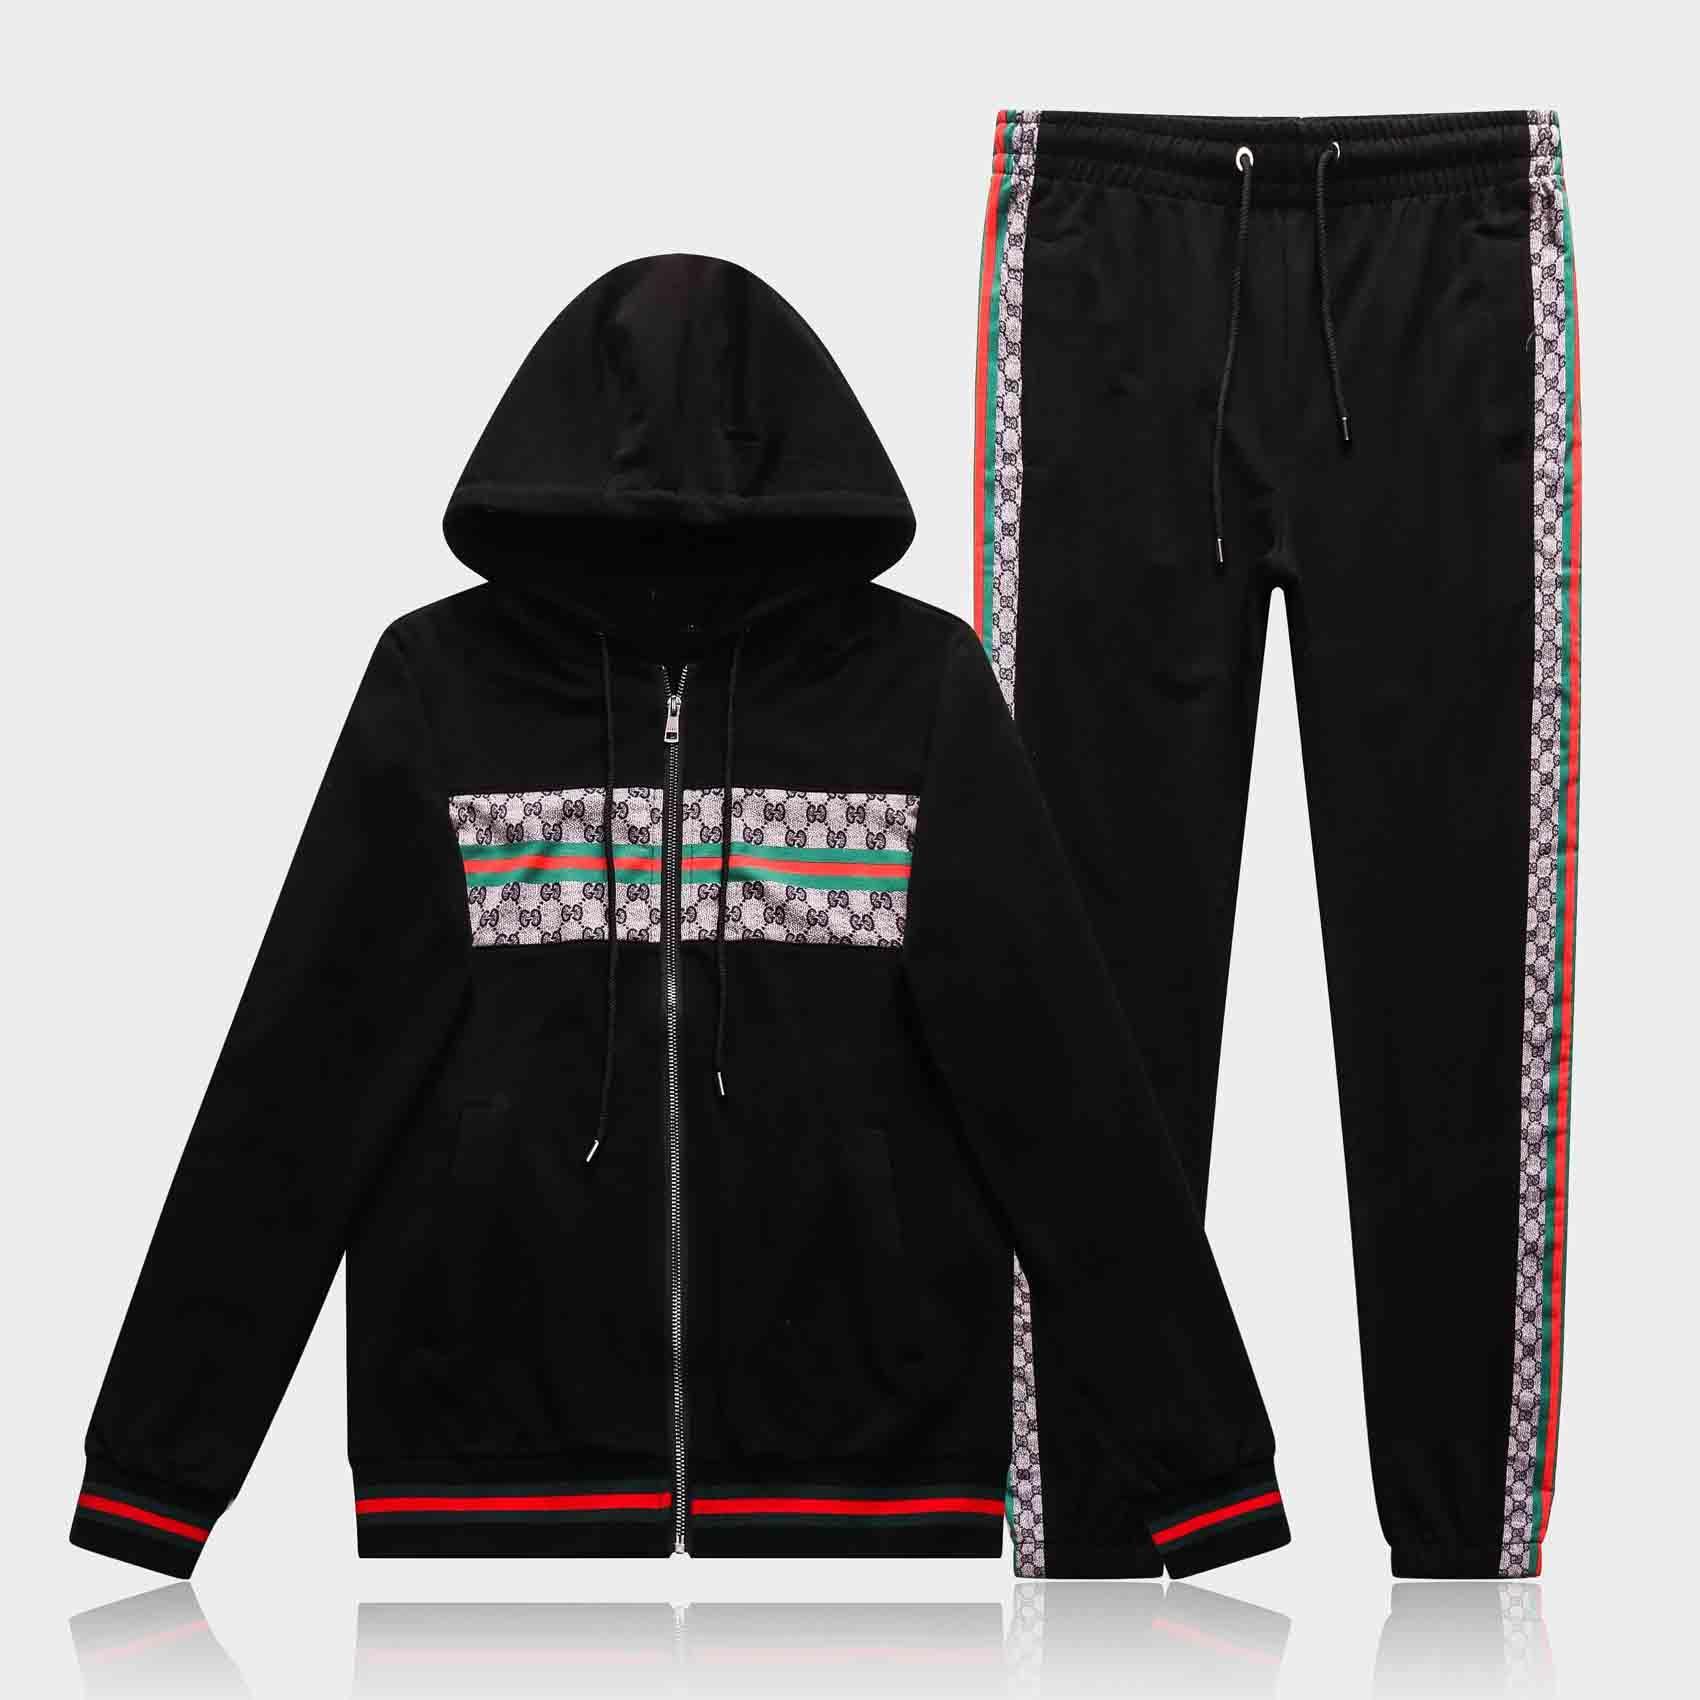 2020New 꼰 편지 남성 스웨터는 정장 조깅 정장 디자인 패션 남성 운동복 재킷 스포츠웨어 세트 땀